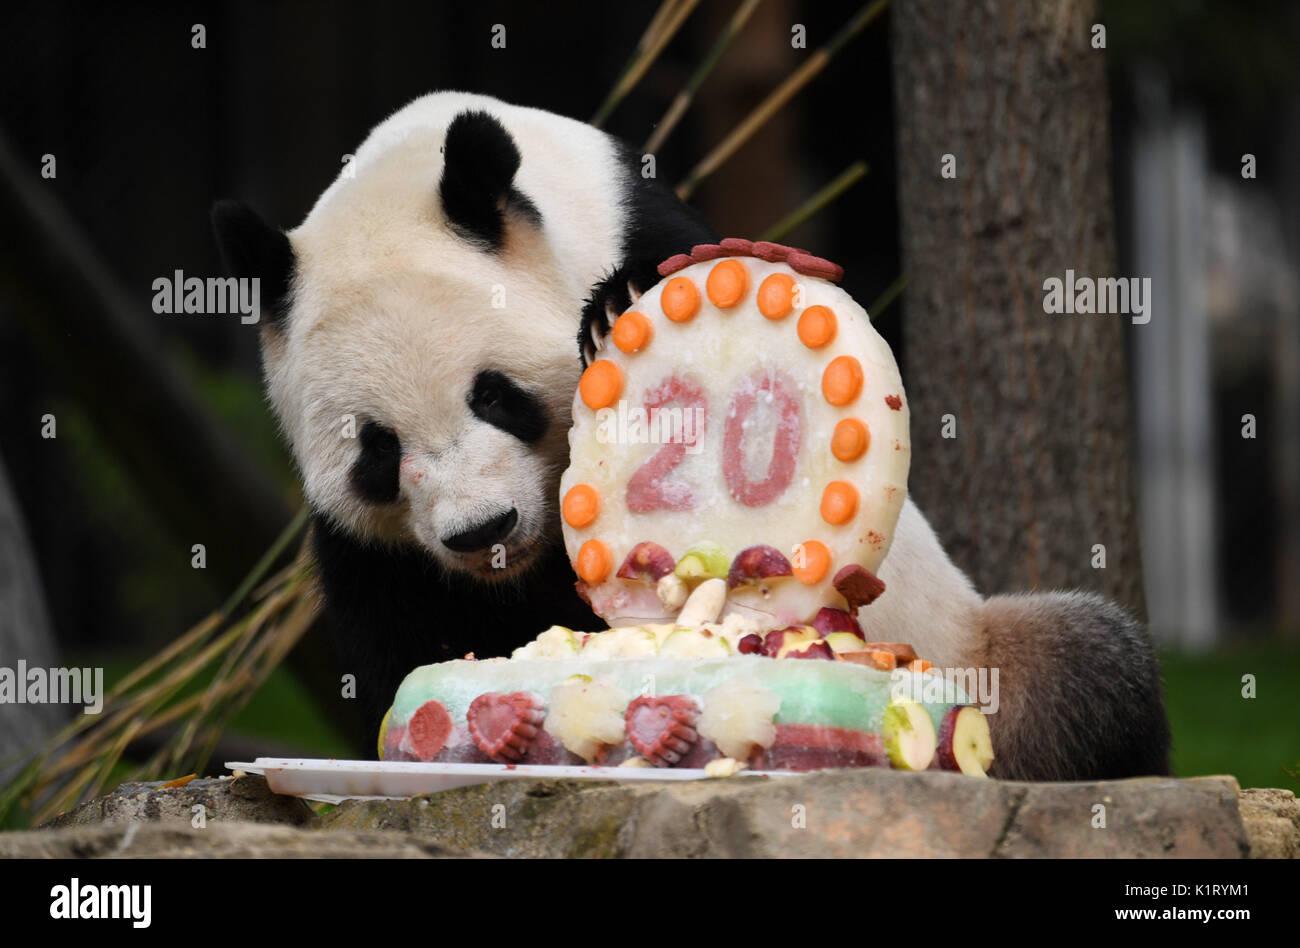 Giant Panda Tian Enjoys Birthday Cake